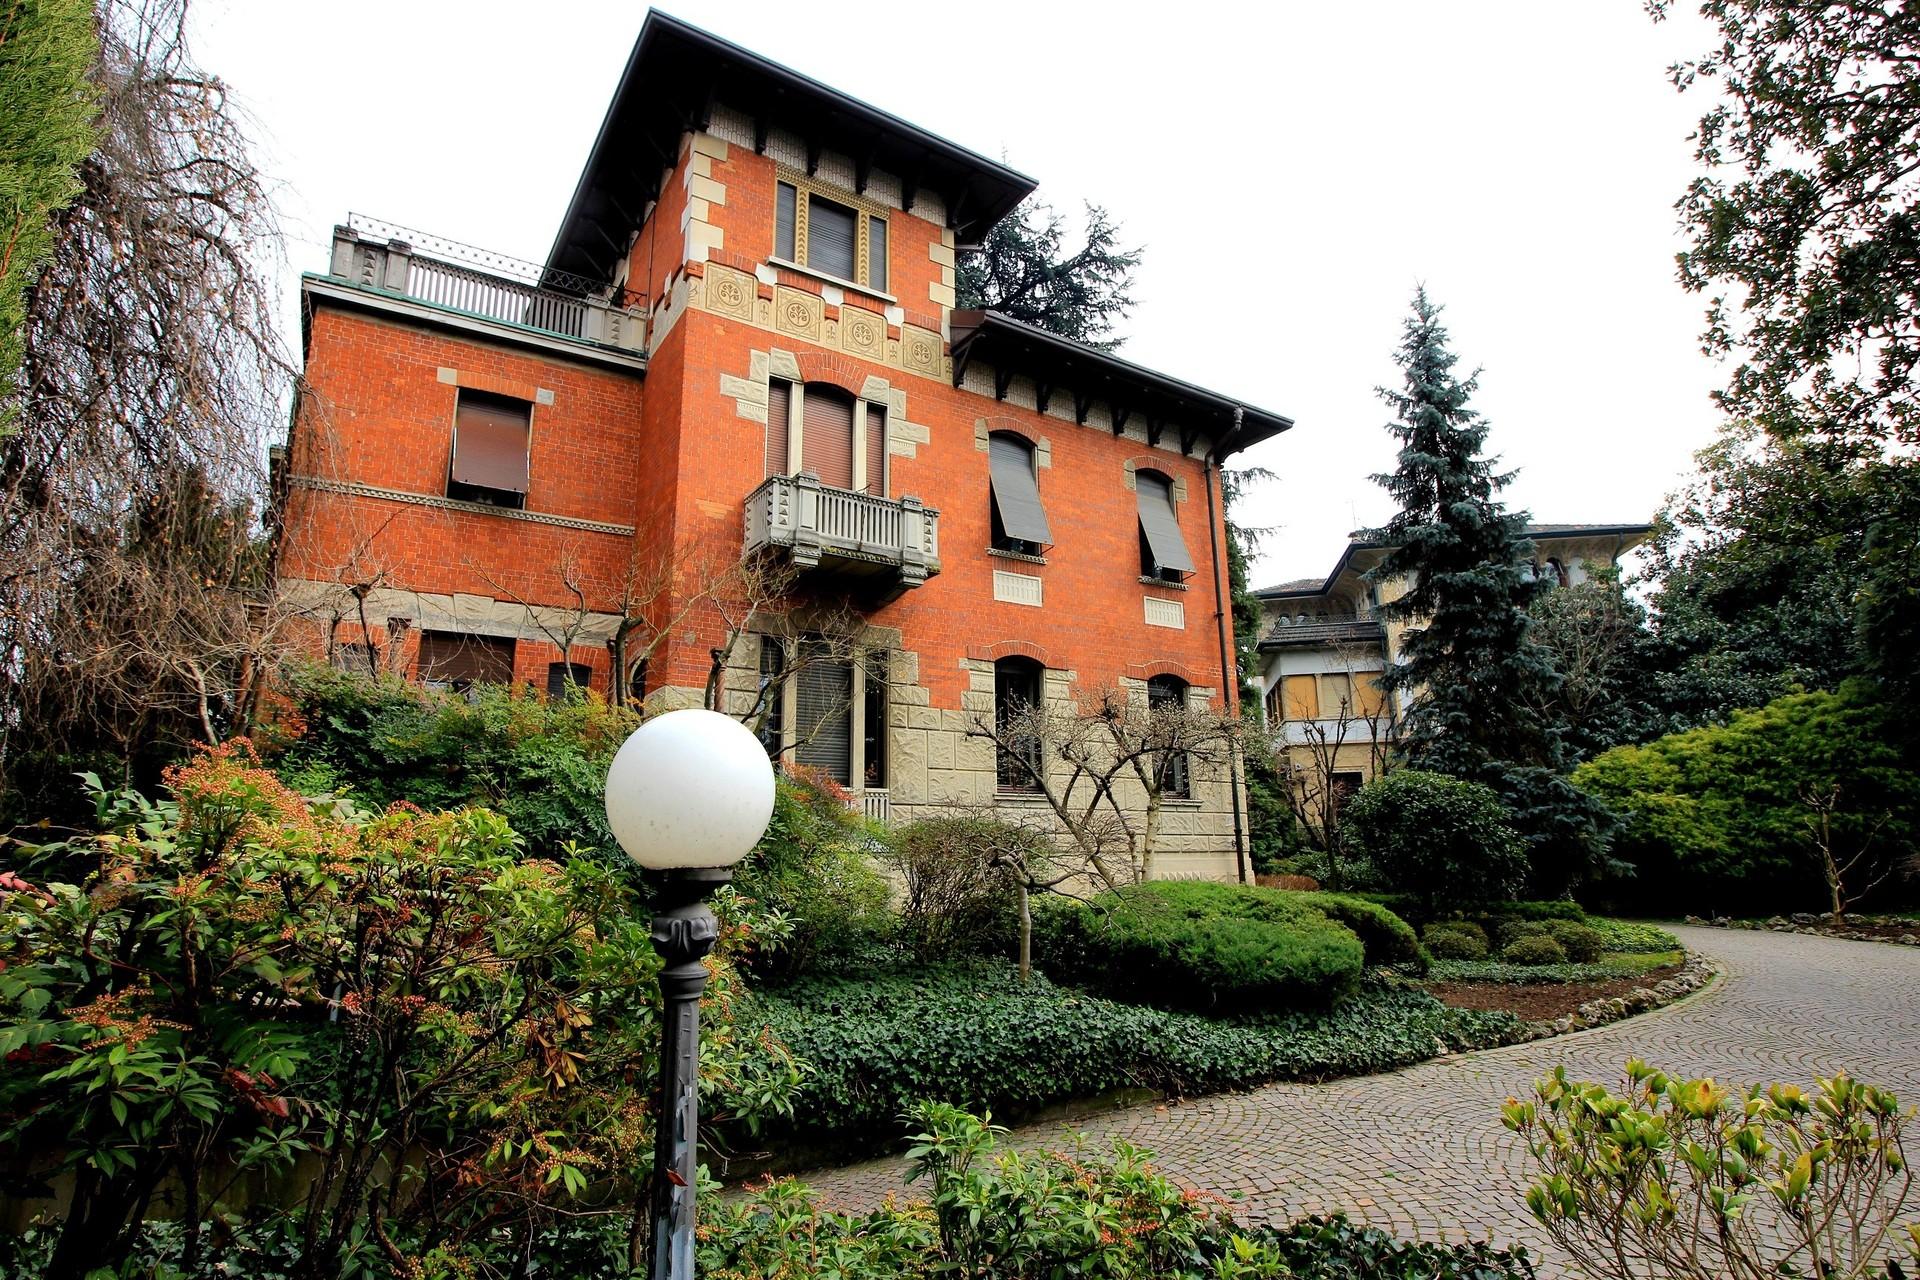 appartamento zona tranquilla cusano milanino lombardia #0013590 - Arredo Bagno Cusano Milanino